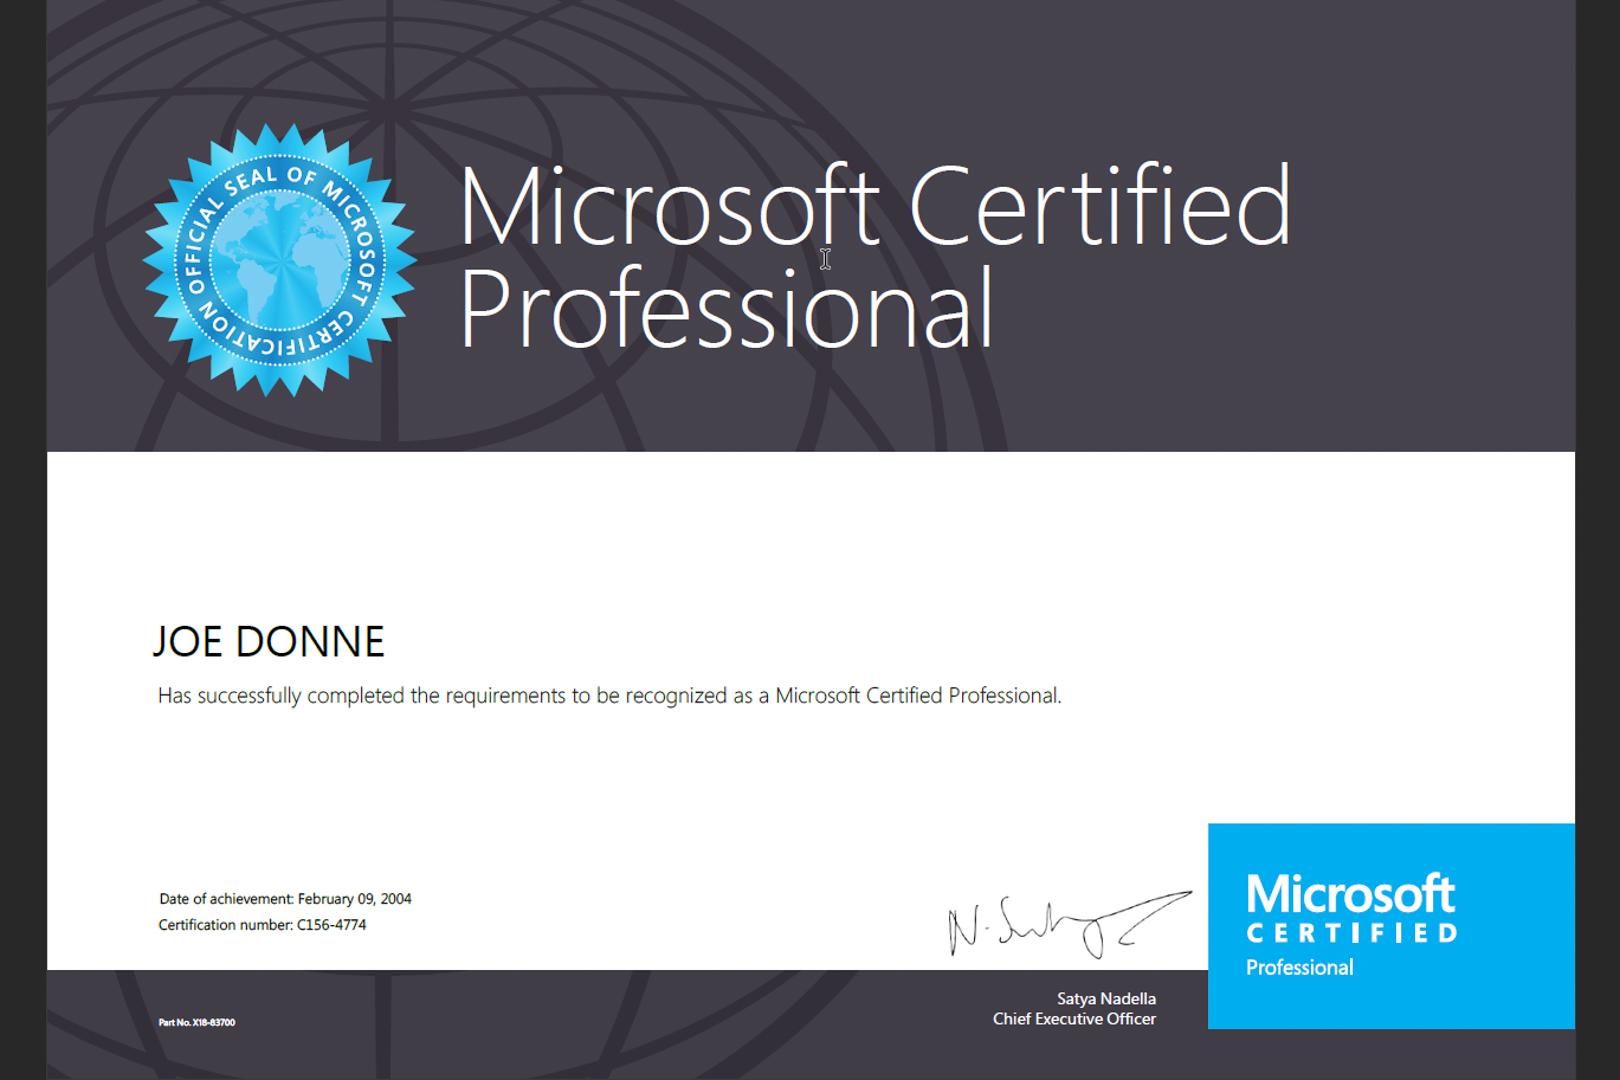 Microsoft Certified Professional - Joe Donne